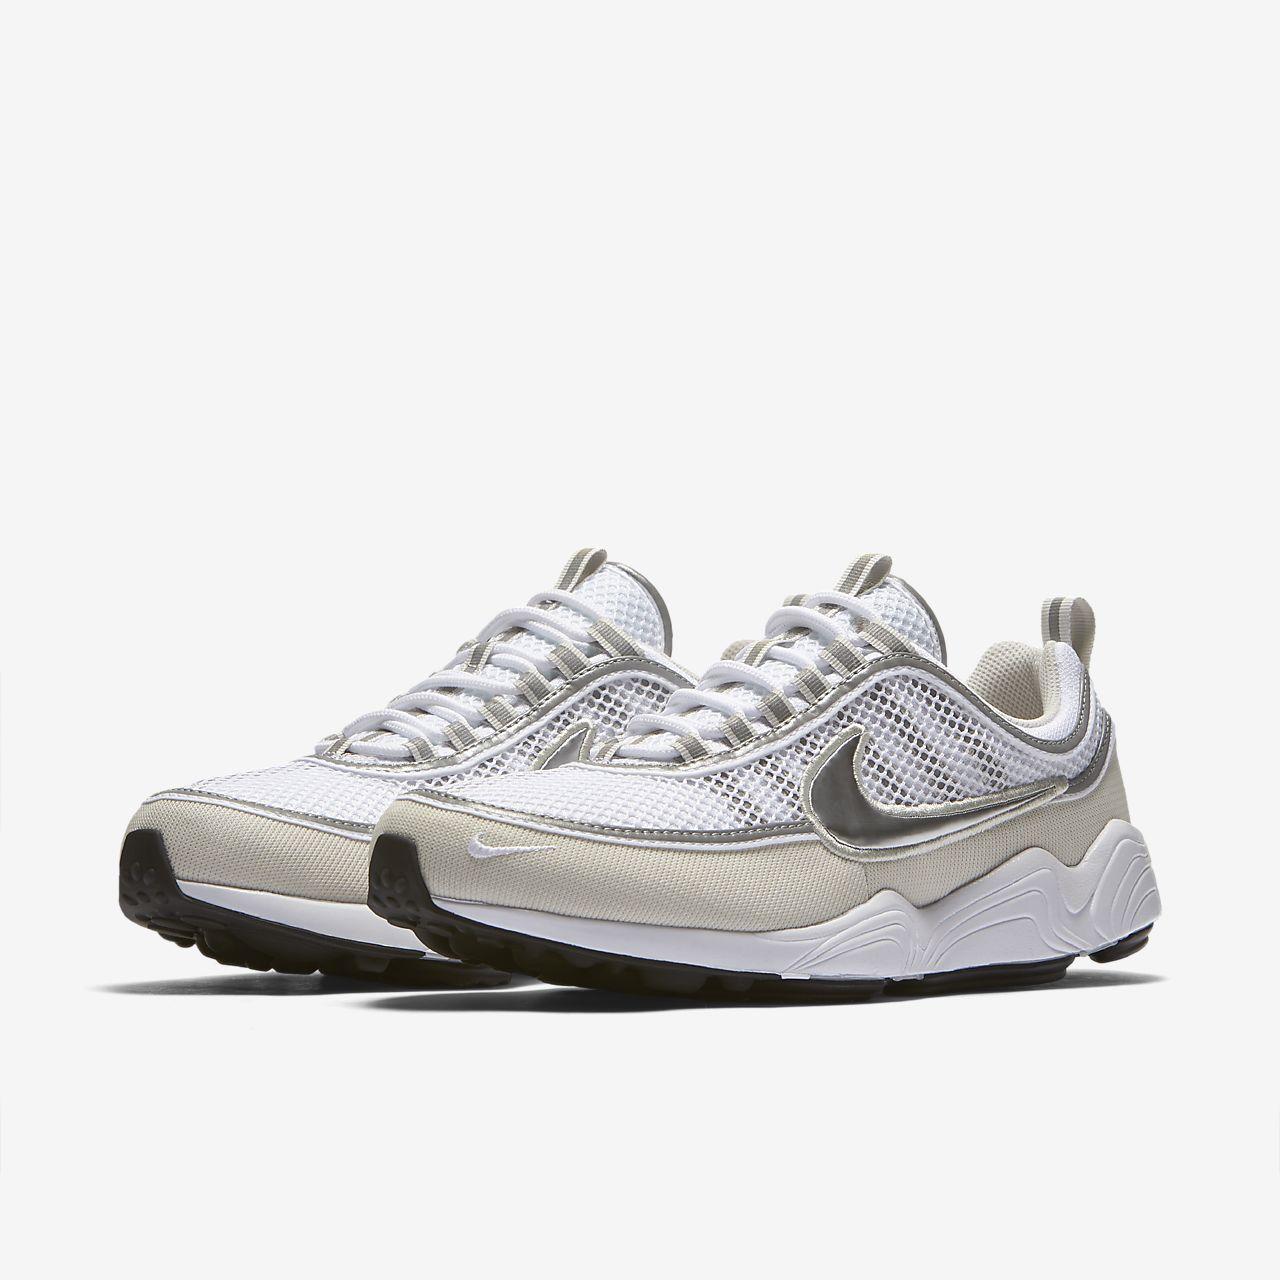 best sneakers 3839d add06 Calzado para hombre Nike Air Zoom Spiridon '16. Nike.com MX